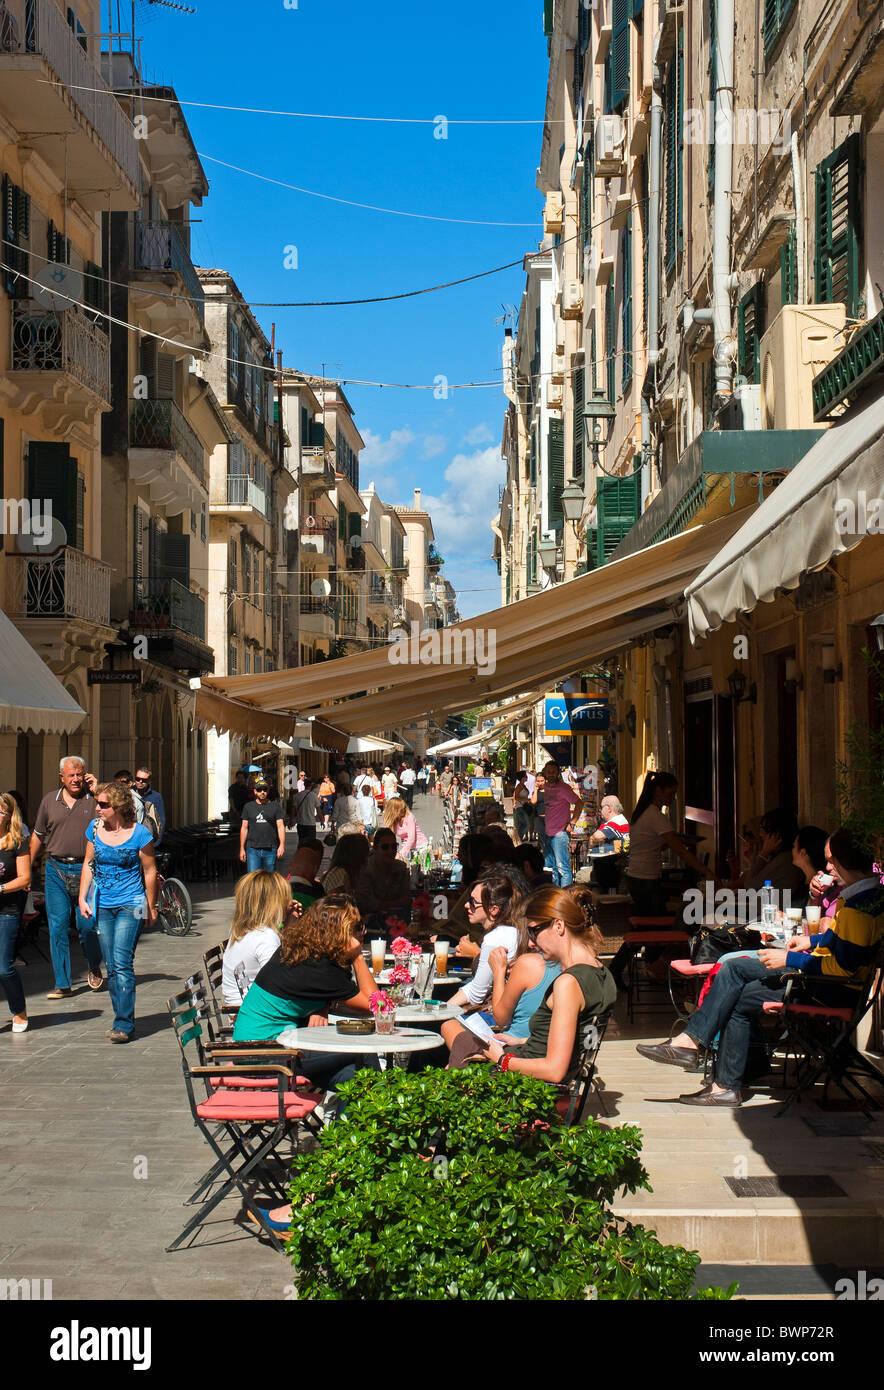 Cafe in Corfu Town, Ionian Islands Greece. - Stock Image